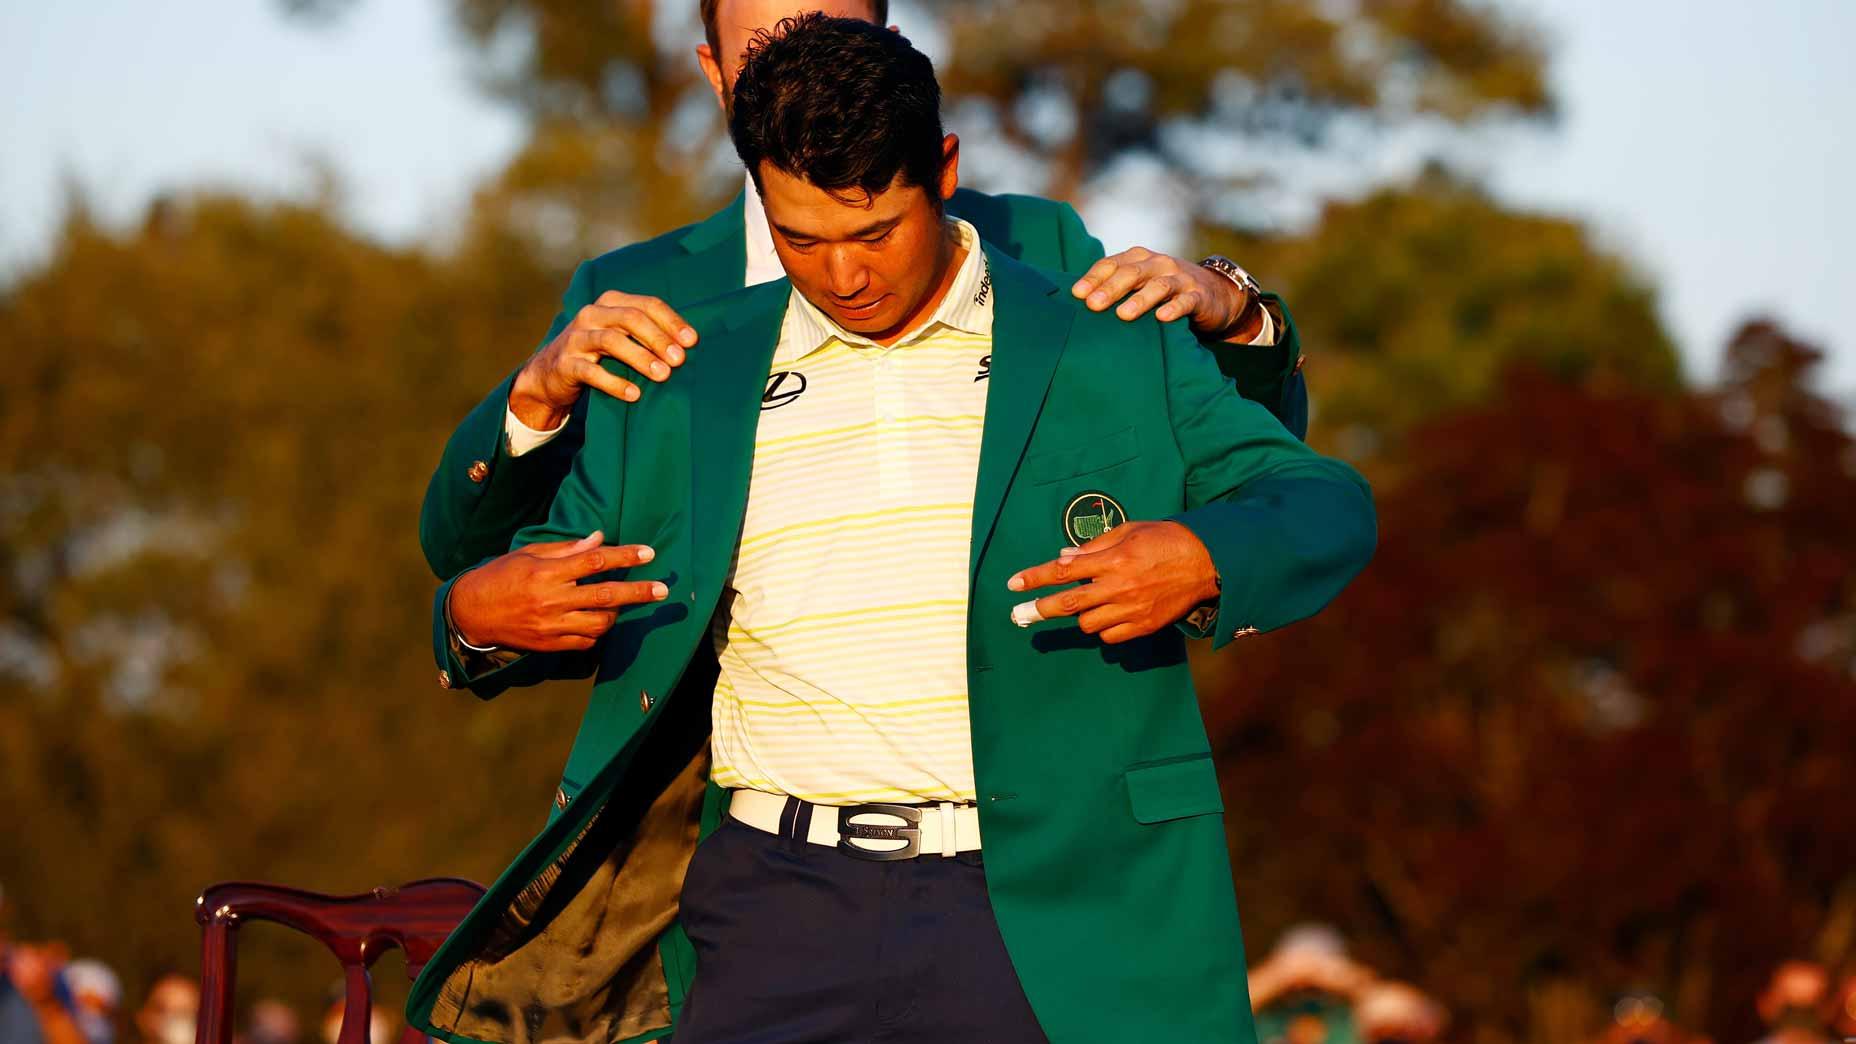 hideki matsuyama slips on the green jacket.